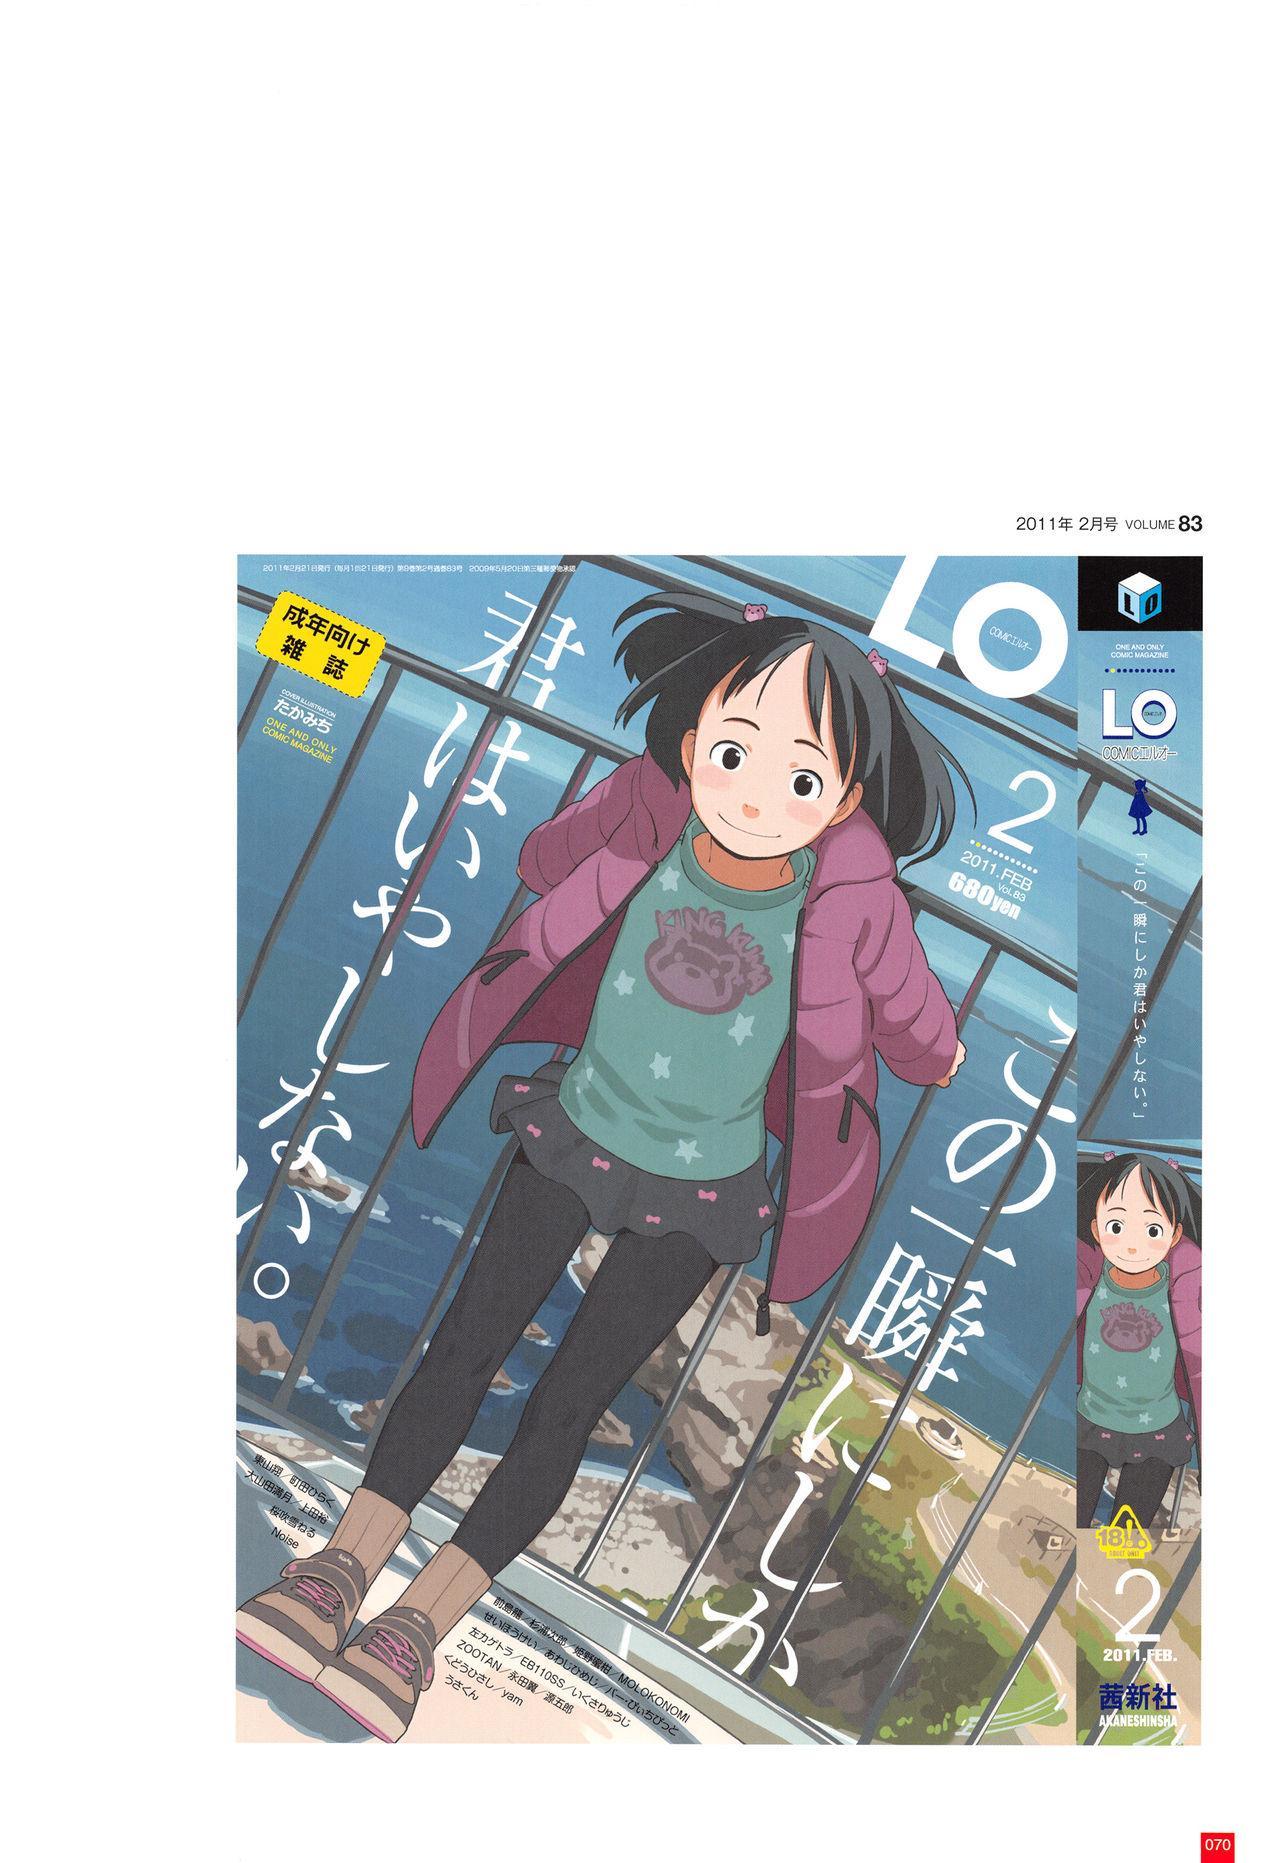 LO Artbook 2-A TAKAMICHI LOOP WORKS 72